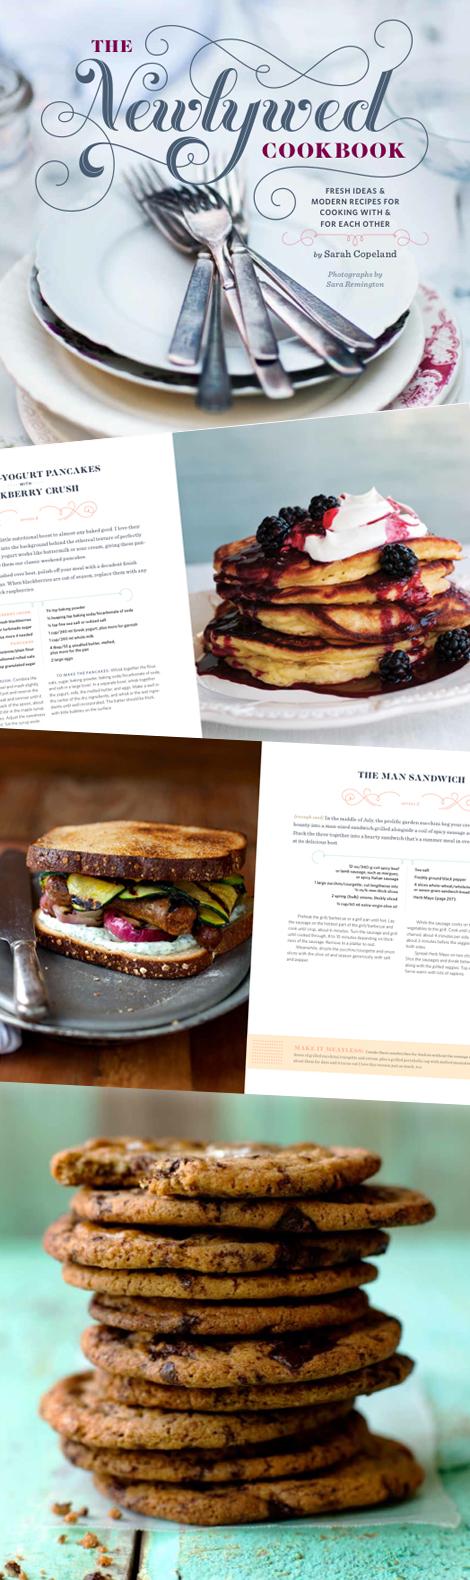 The-newlywed-cookbook-sarah-copeland